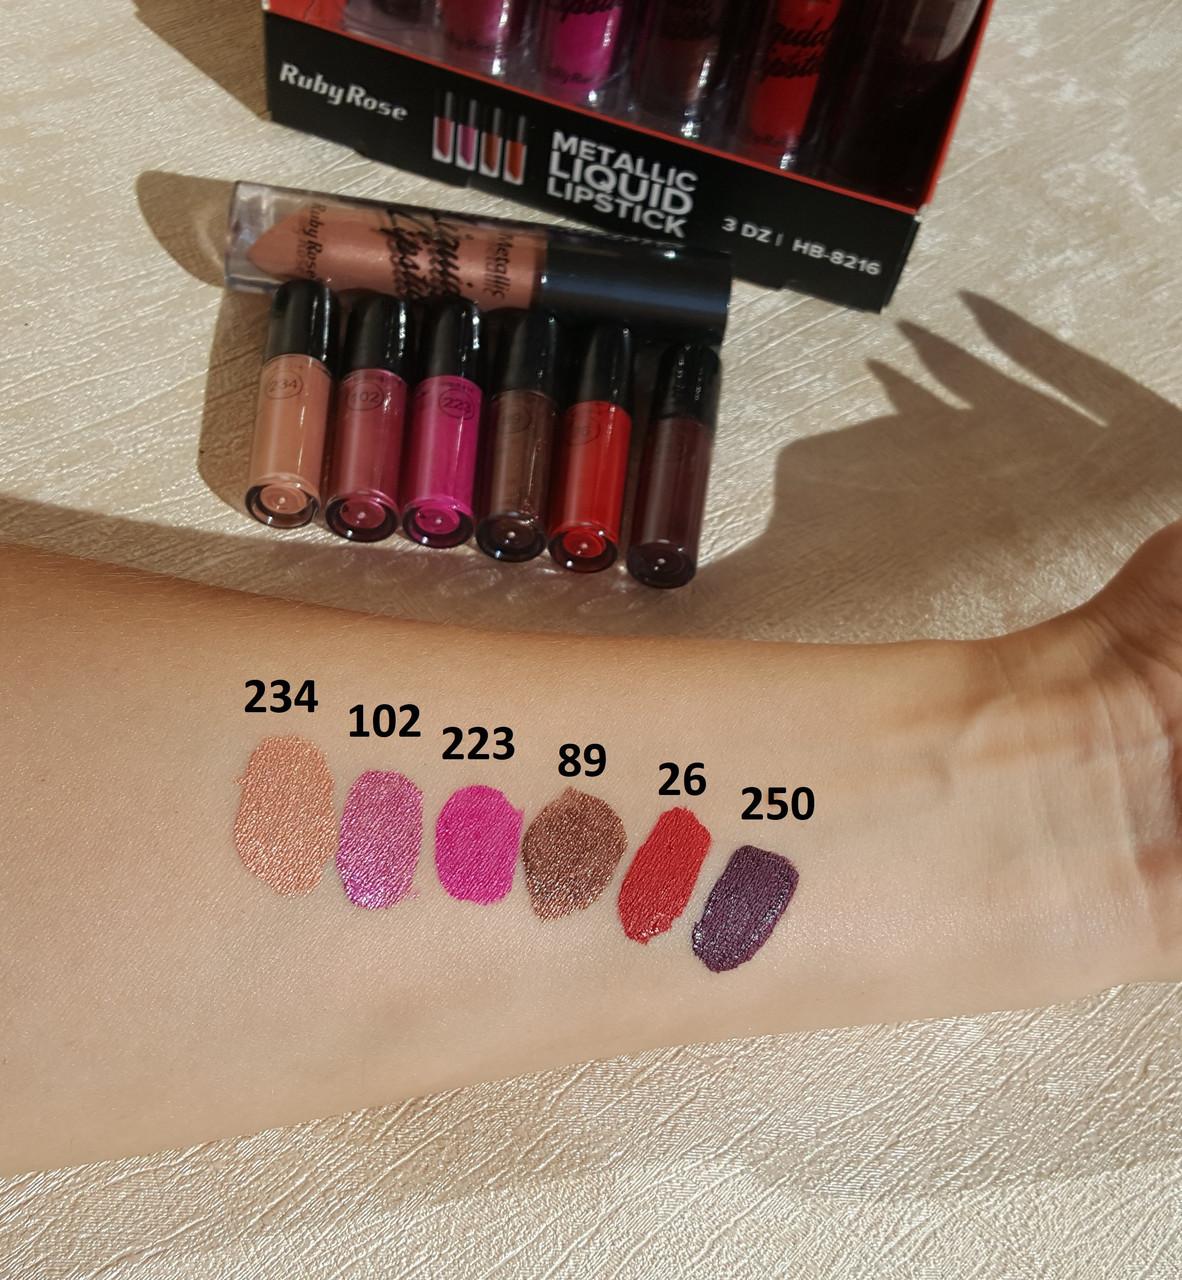 Ruby Rose палетка теней 9979 Catchy Eyes (32 теней + 2 праймера ... | 1280x1182